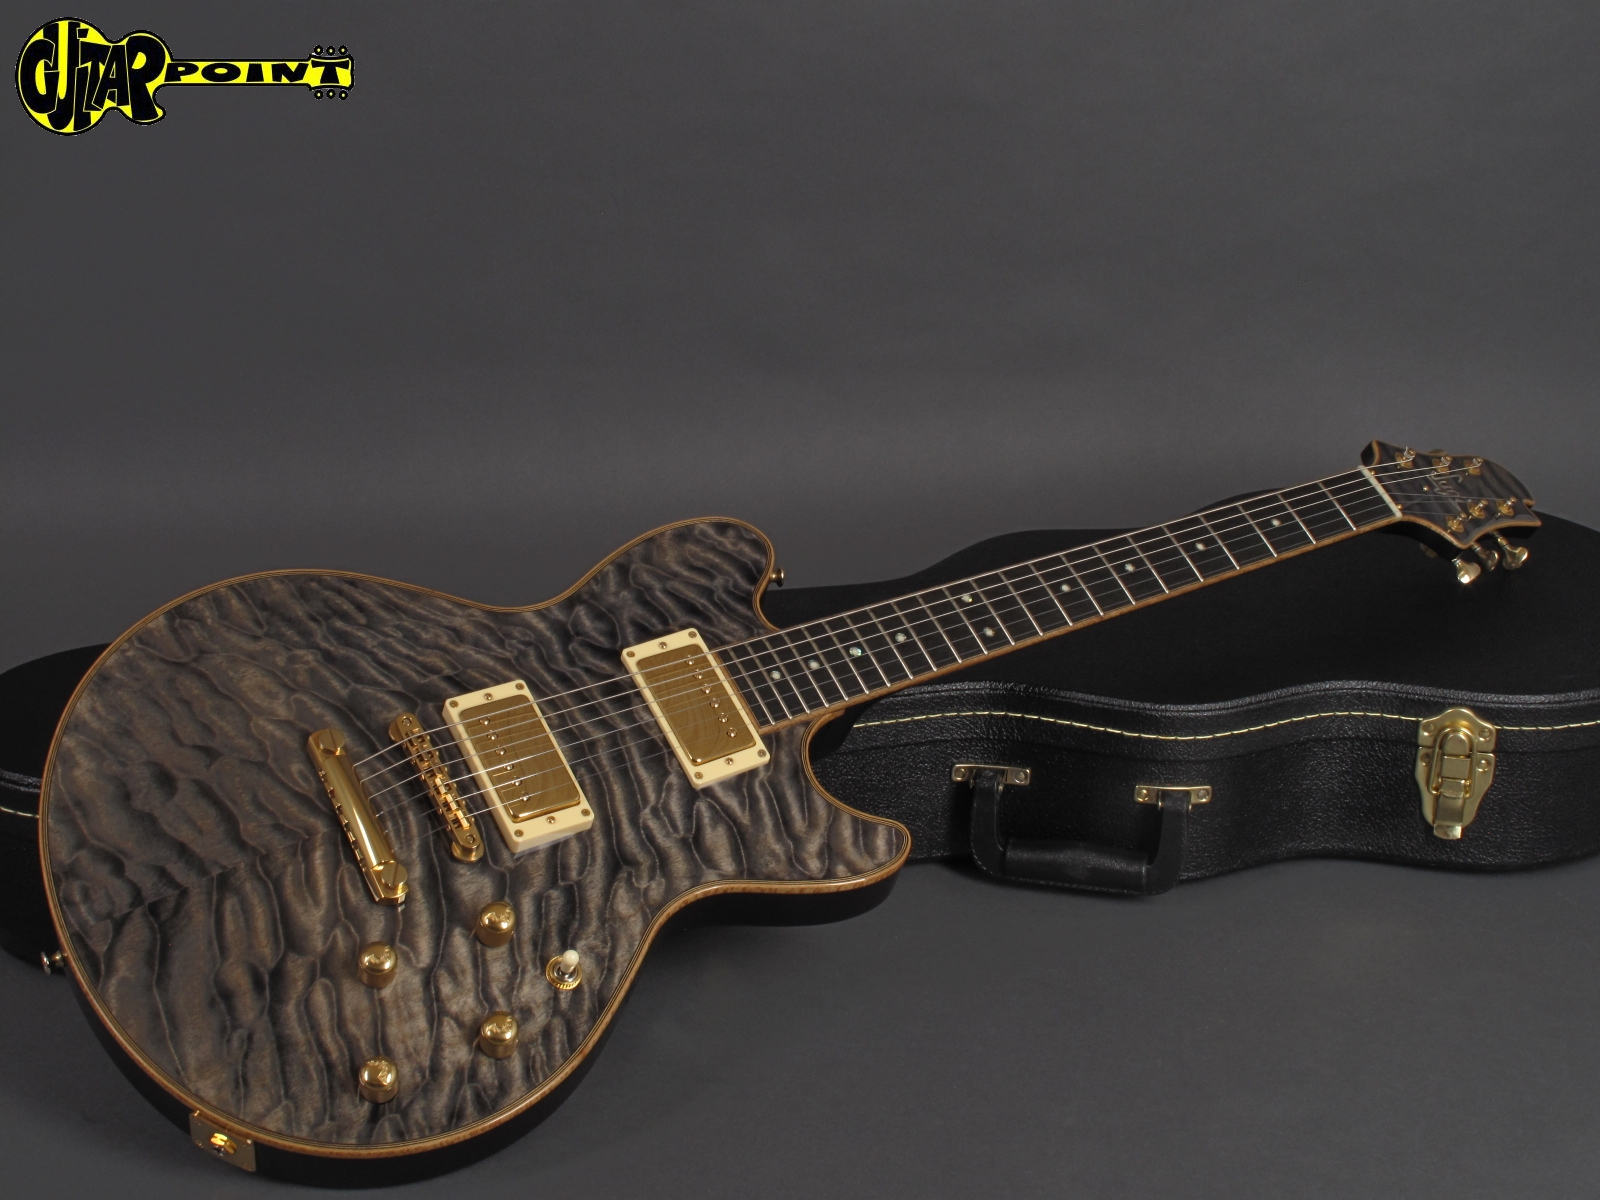 https://guitarpoint.de/app/uploads/products/sugi-model-sa605e-em-lc-trans-grey/Sugi_SA605_S900079_4.jpg